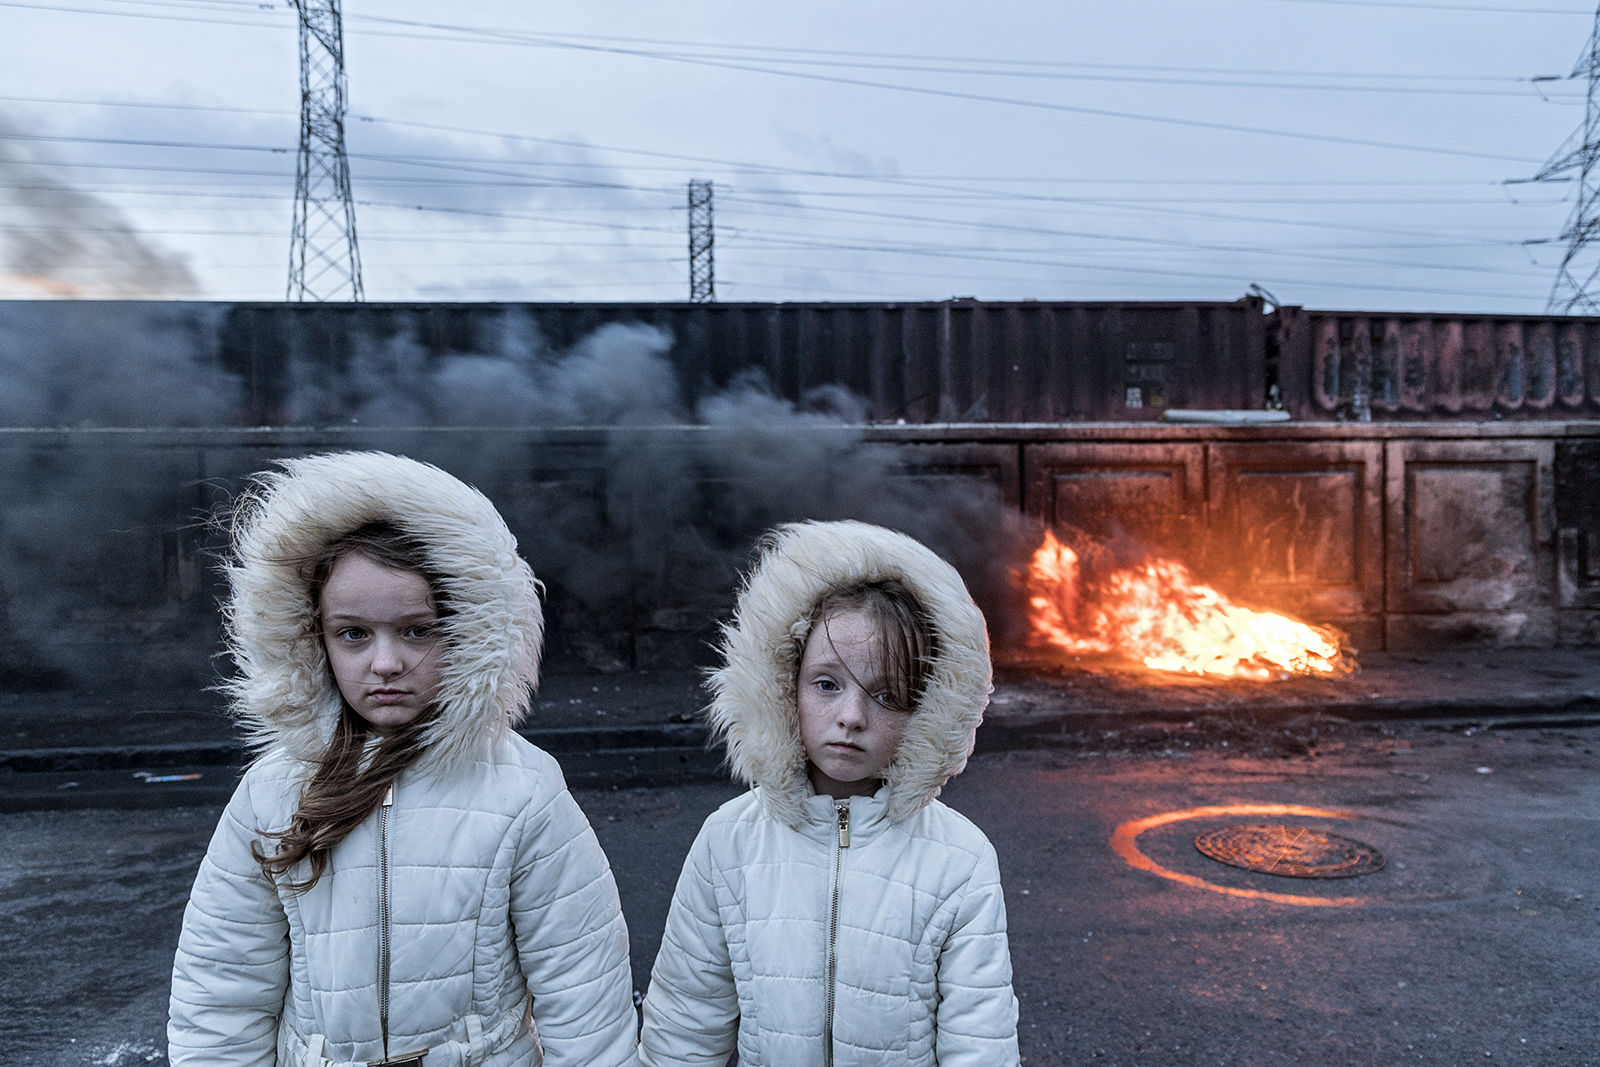 Kathleen and Bridget, Sisters, Dublin, Ireland 2020